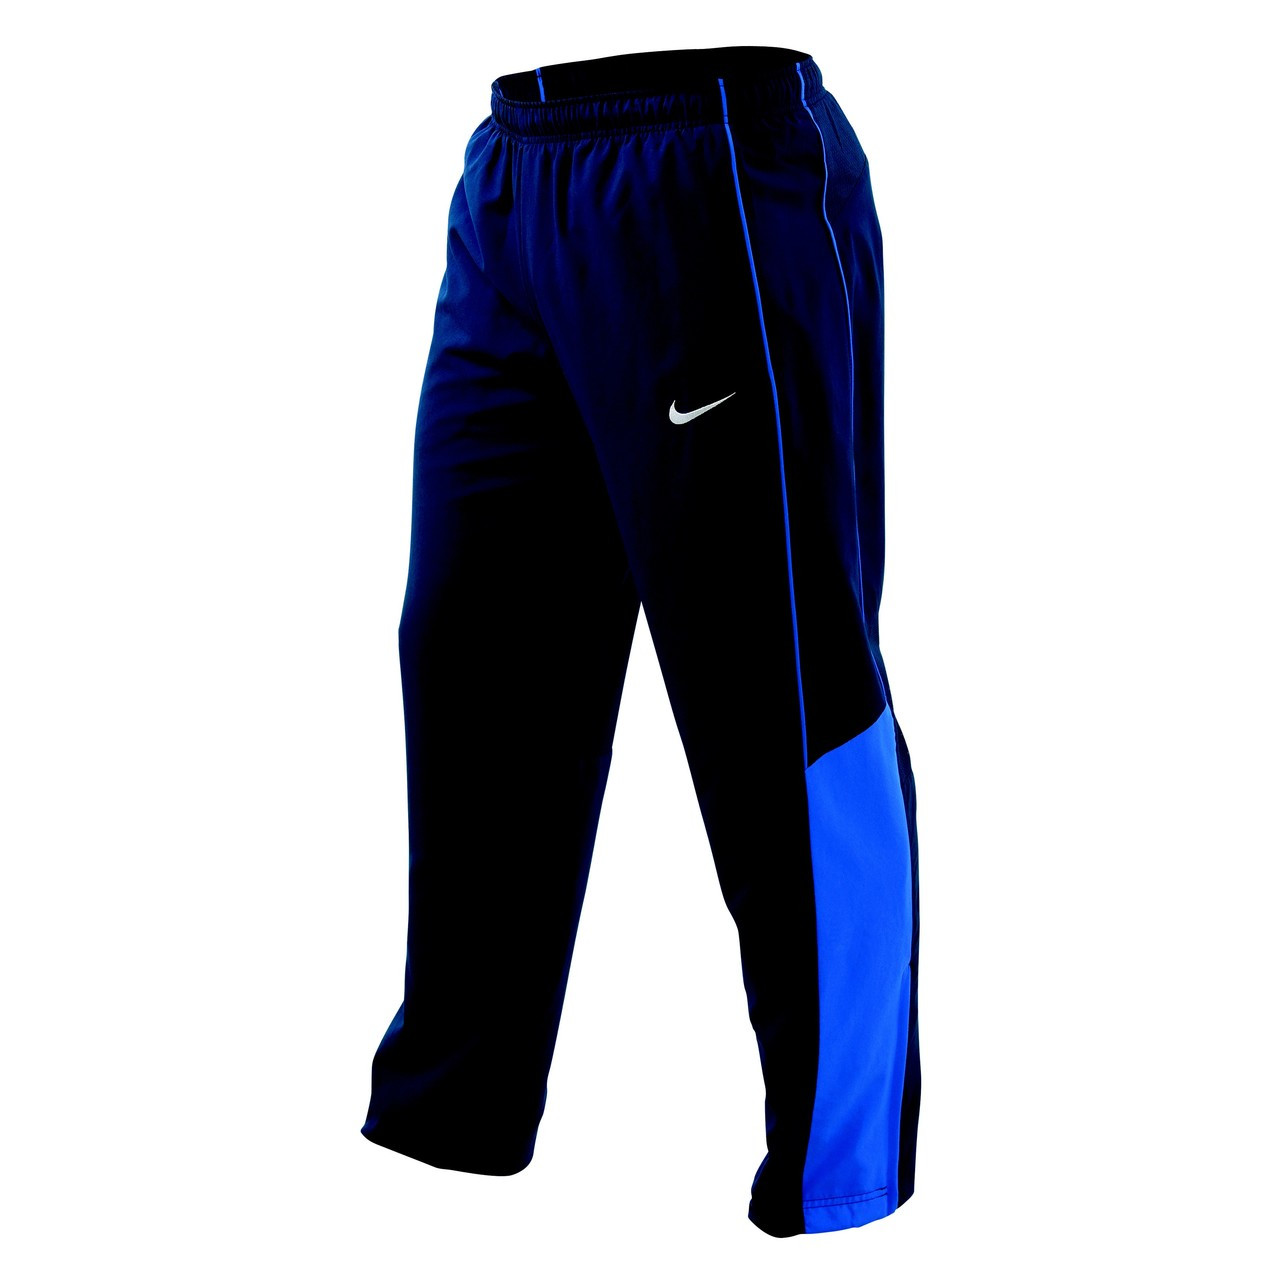 separation shoes 95784 cd311 ... Nike Team Presentation Warm-Up Straight Leg Tracksuit - ADULT - Royal  Blue Obsidian